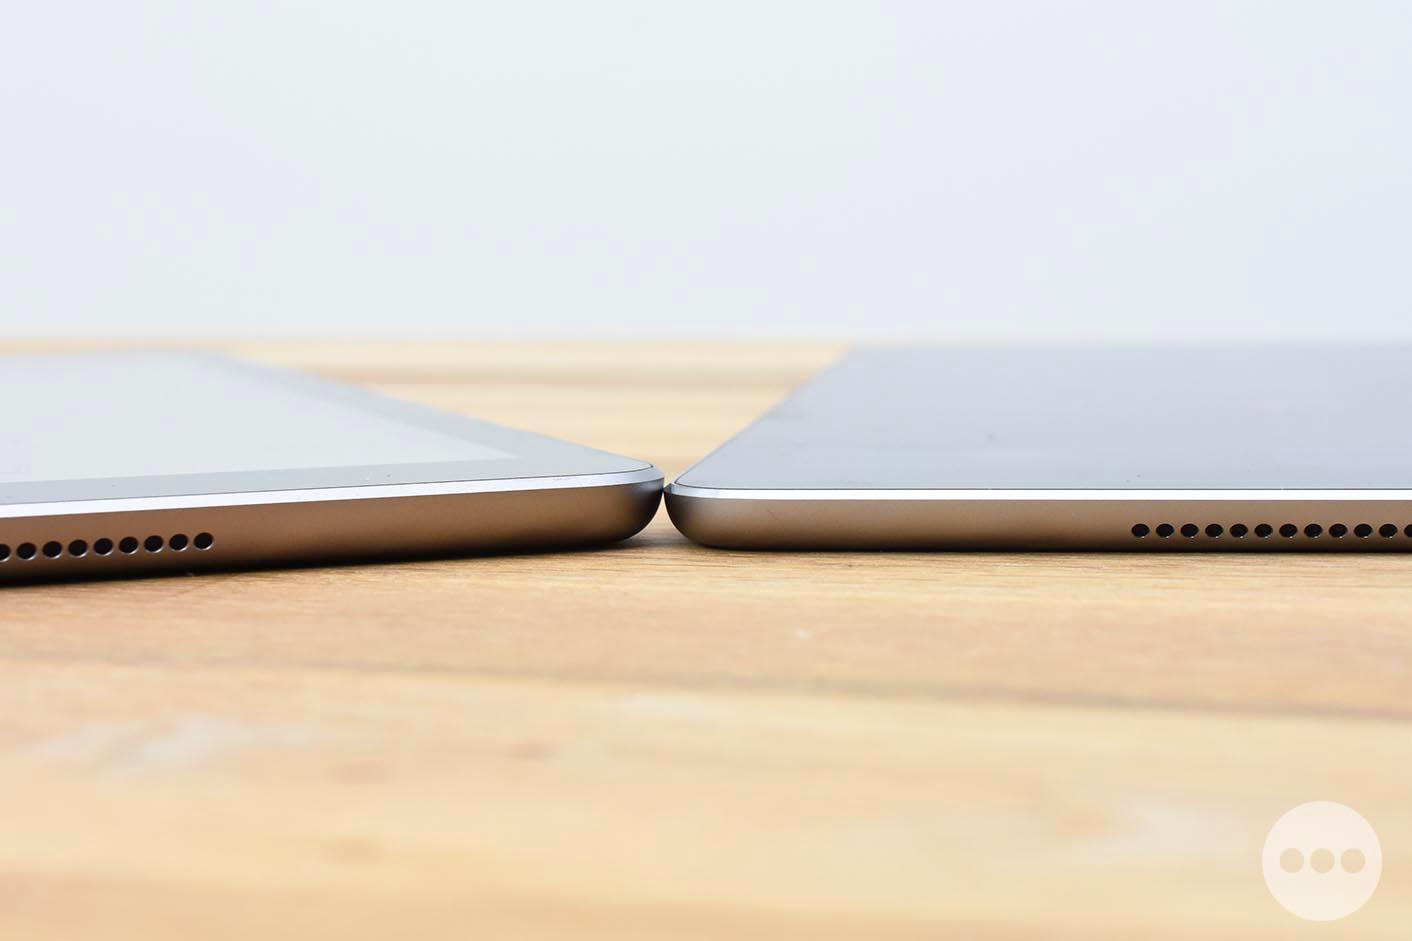 iPad 5 épaisseur